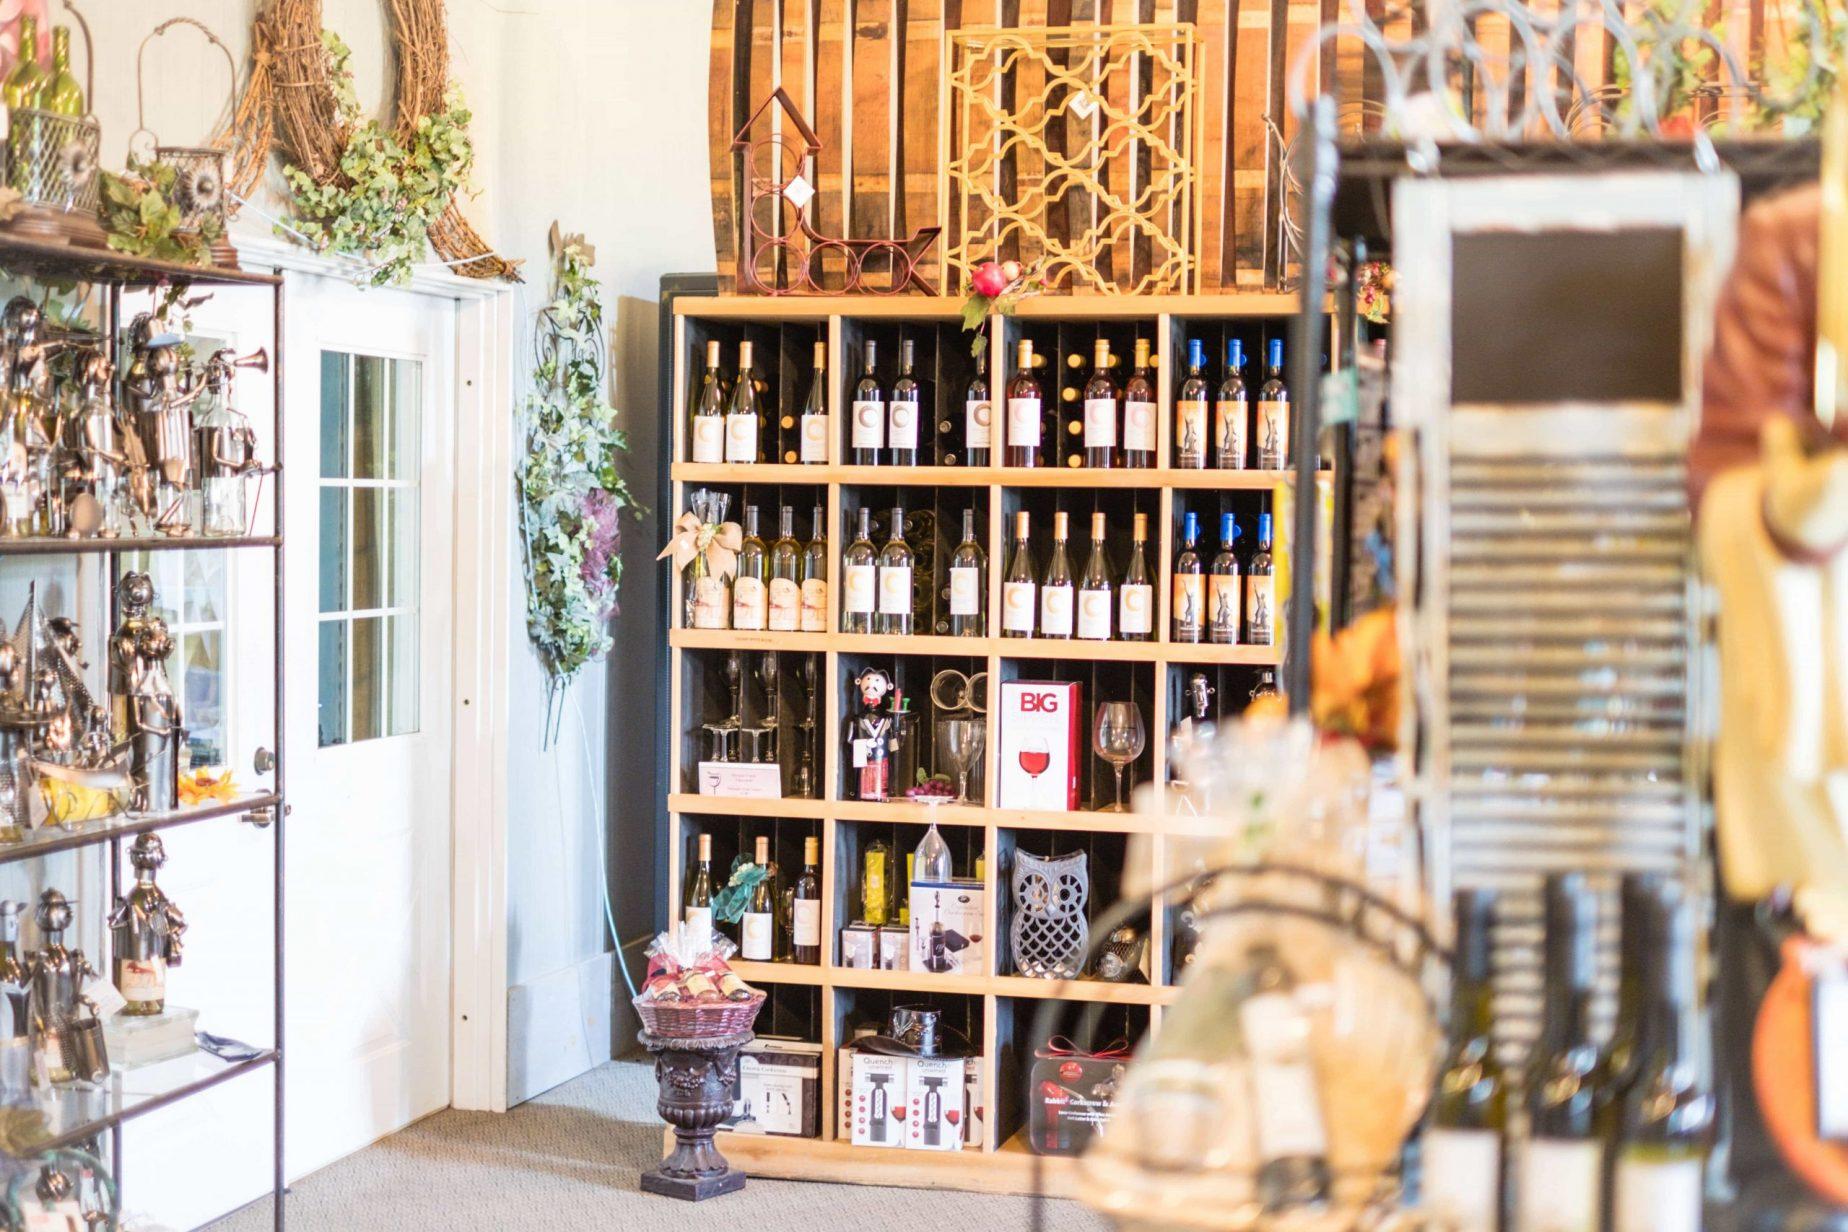 Morgan Creek Winery - Is This Alabama Winery Worth The Trip? #whatsavvysaid #winery #travel #morgancreekwinery #wheresavvywent #visitalabama #vineyard #falldecor #winetasting